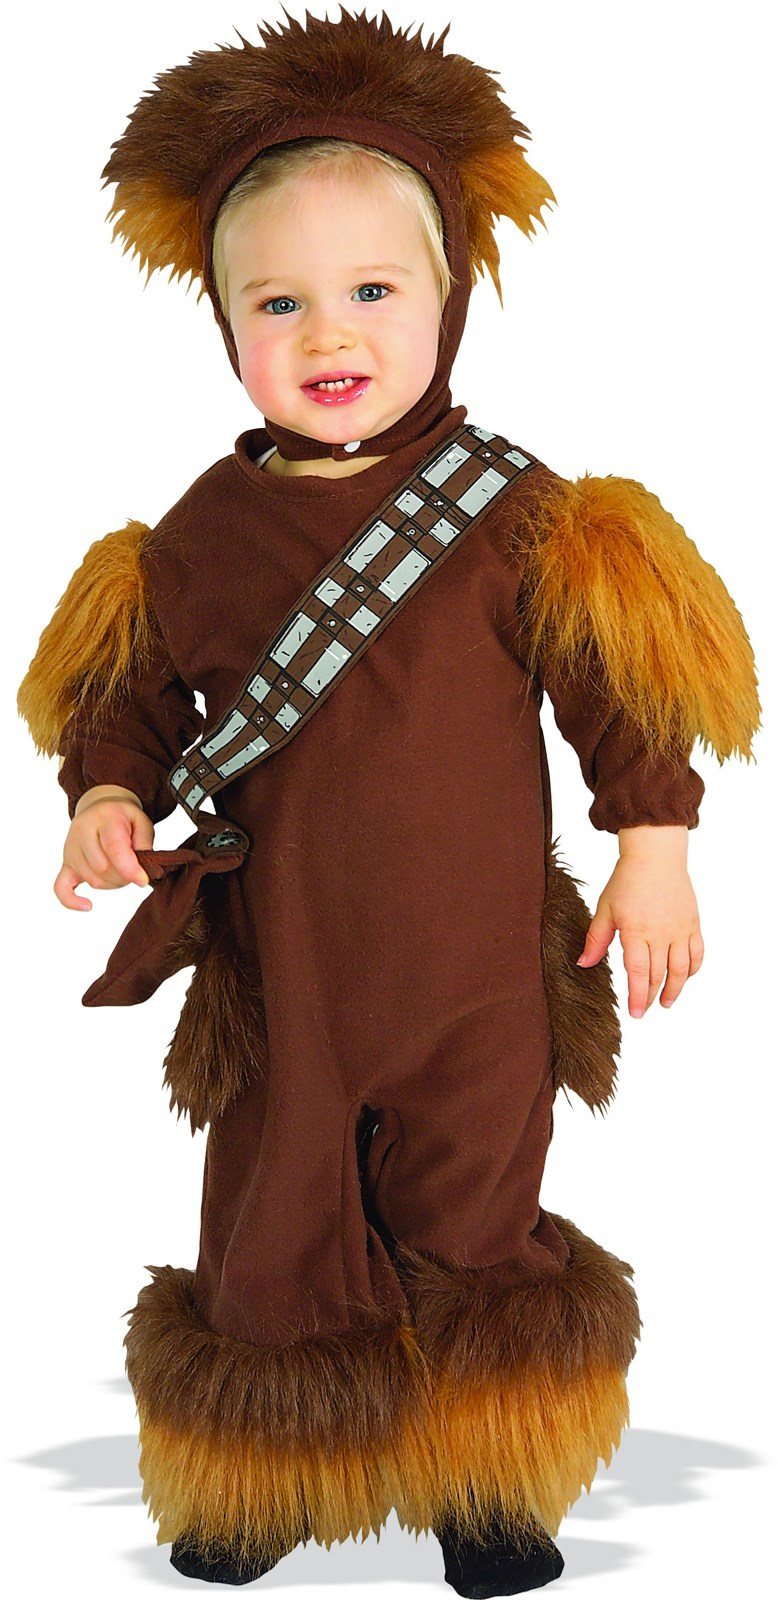 Star Wars Chewbacca Fleece Infant / Toddler Costume | BuyCostumes.com